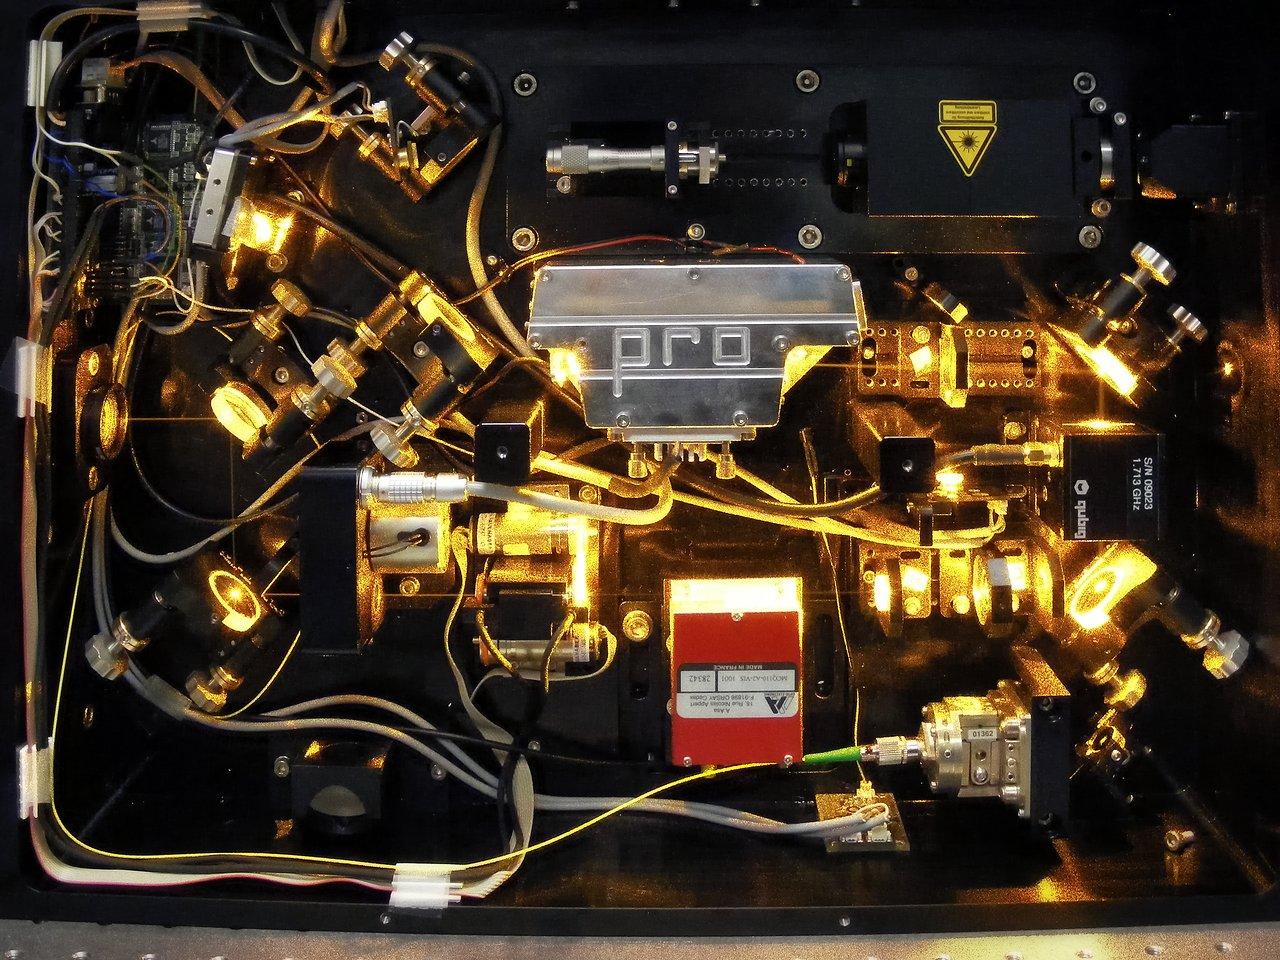 Raman fibre laser